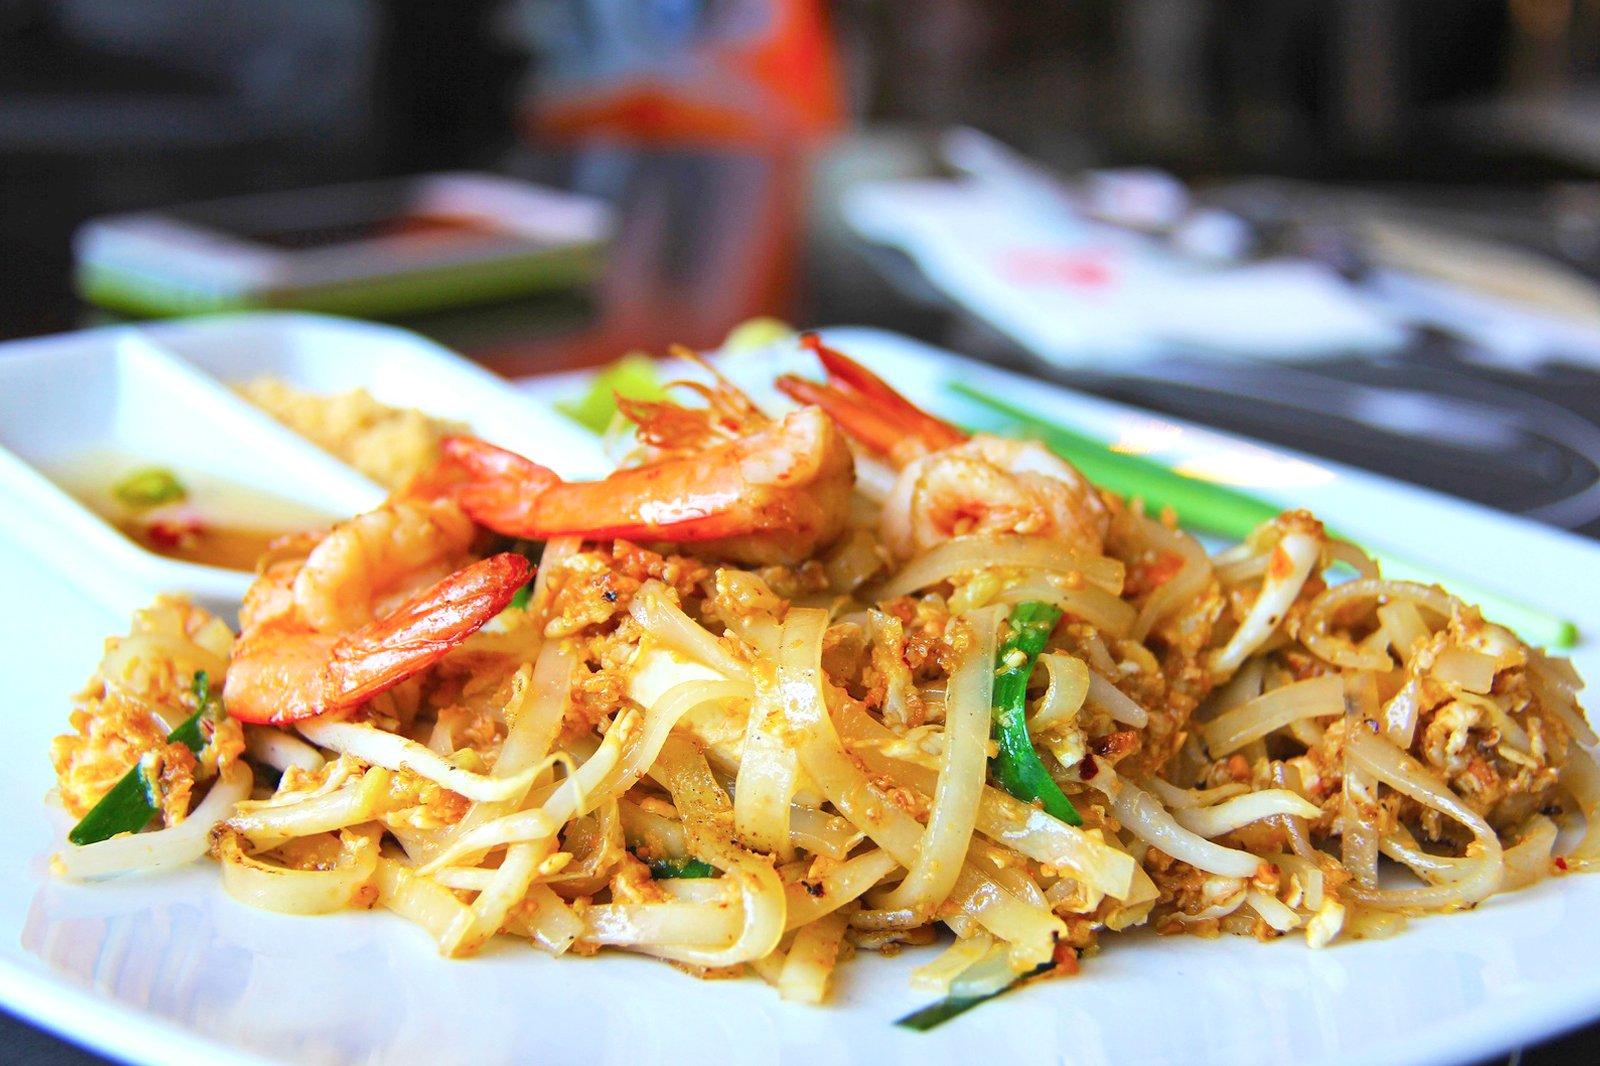 15 Best Singaporean Foods 3c7f1ac3-d65f-47a4-aab7-c3c5a8954af6